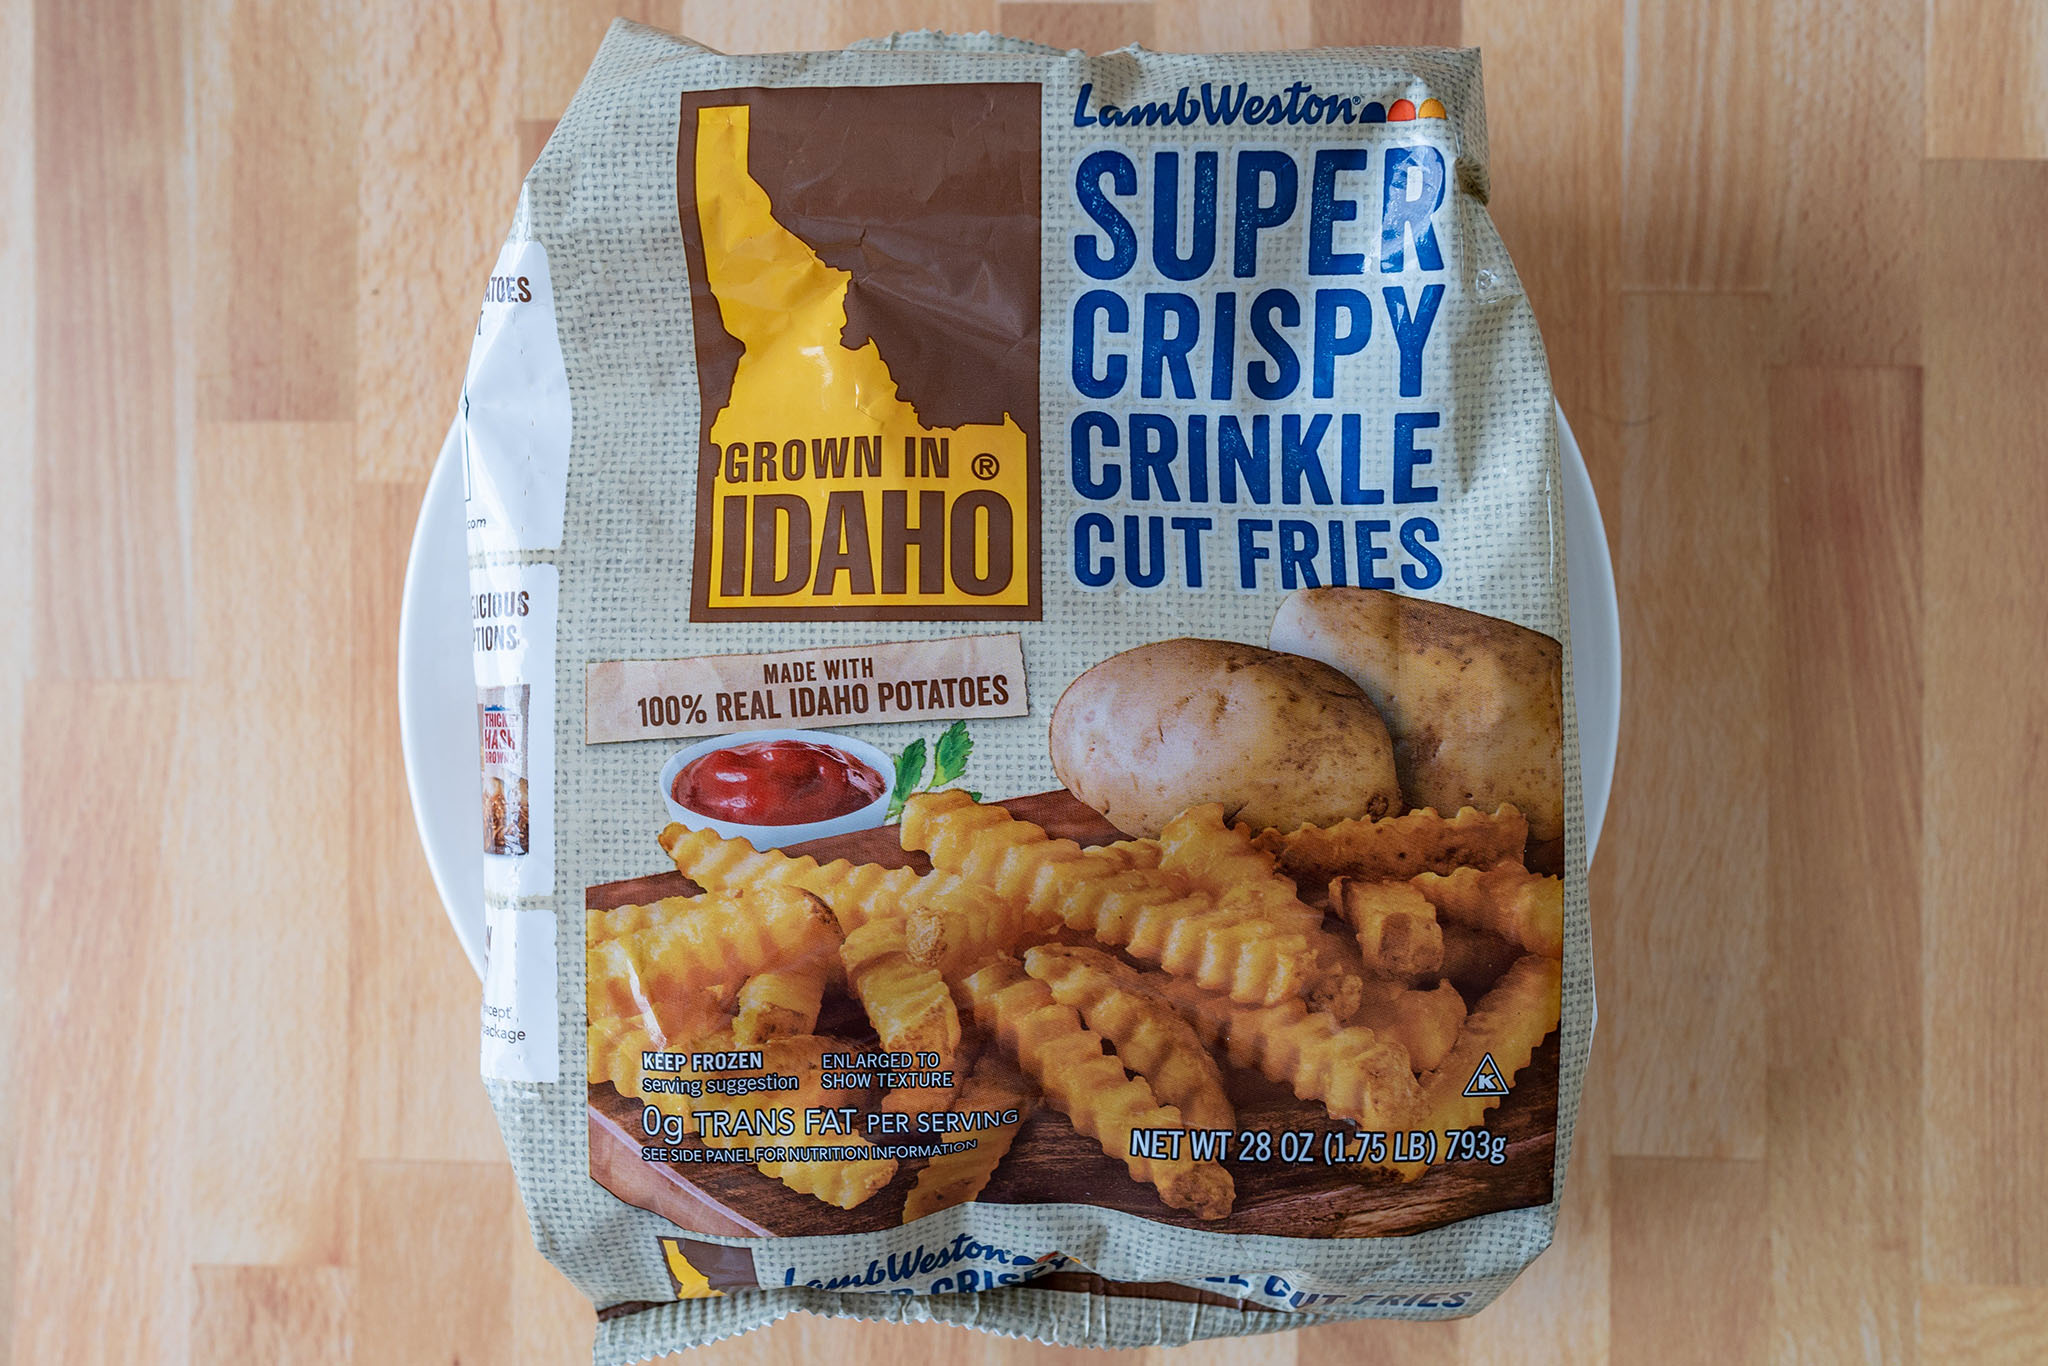 Lamb Weston Super Crispy Crinkle Cut Fries